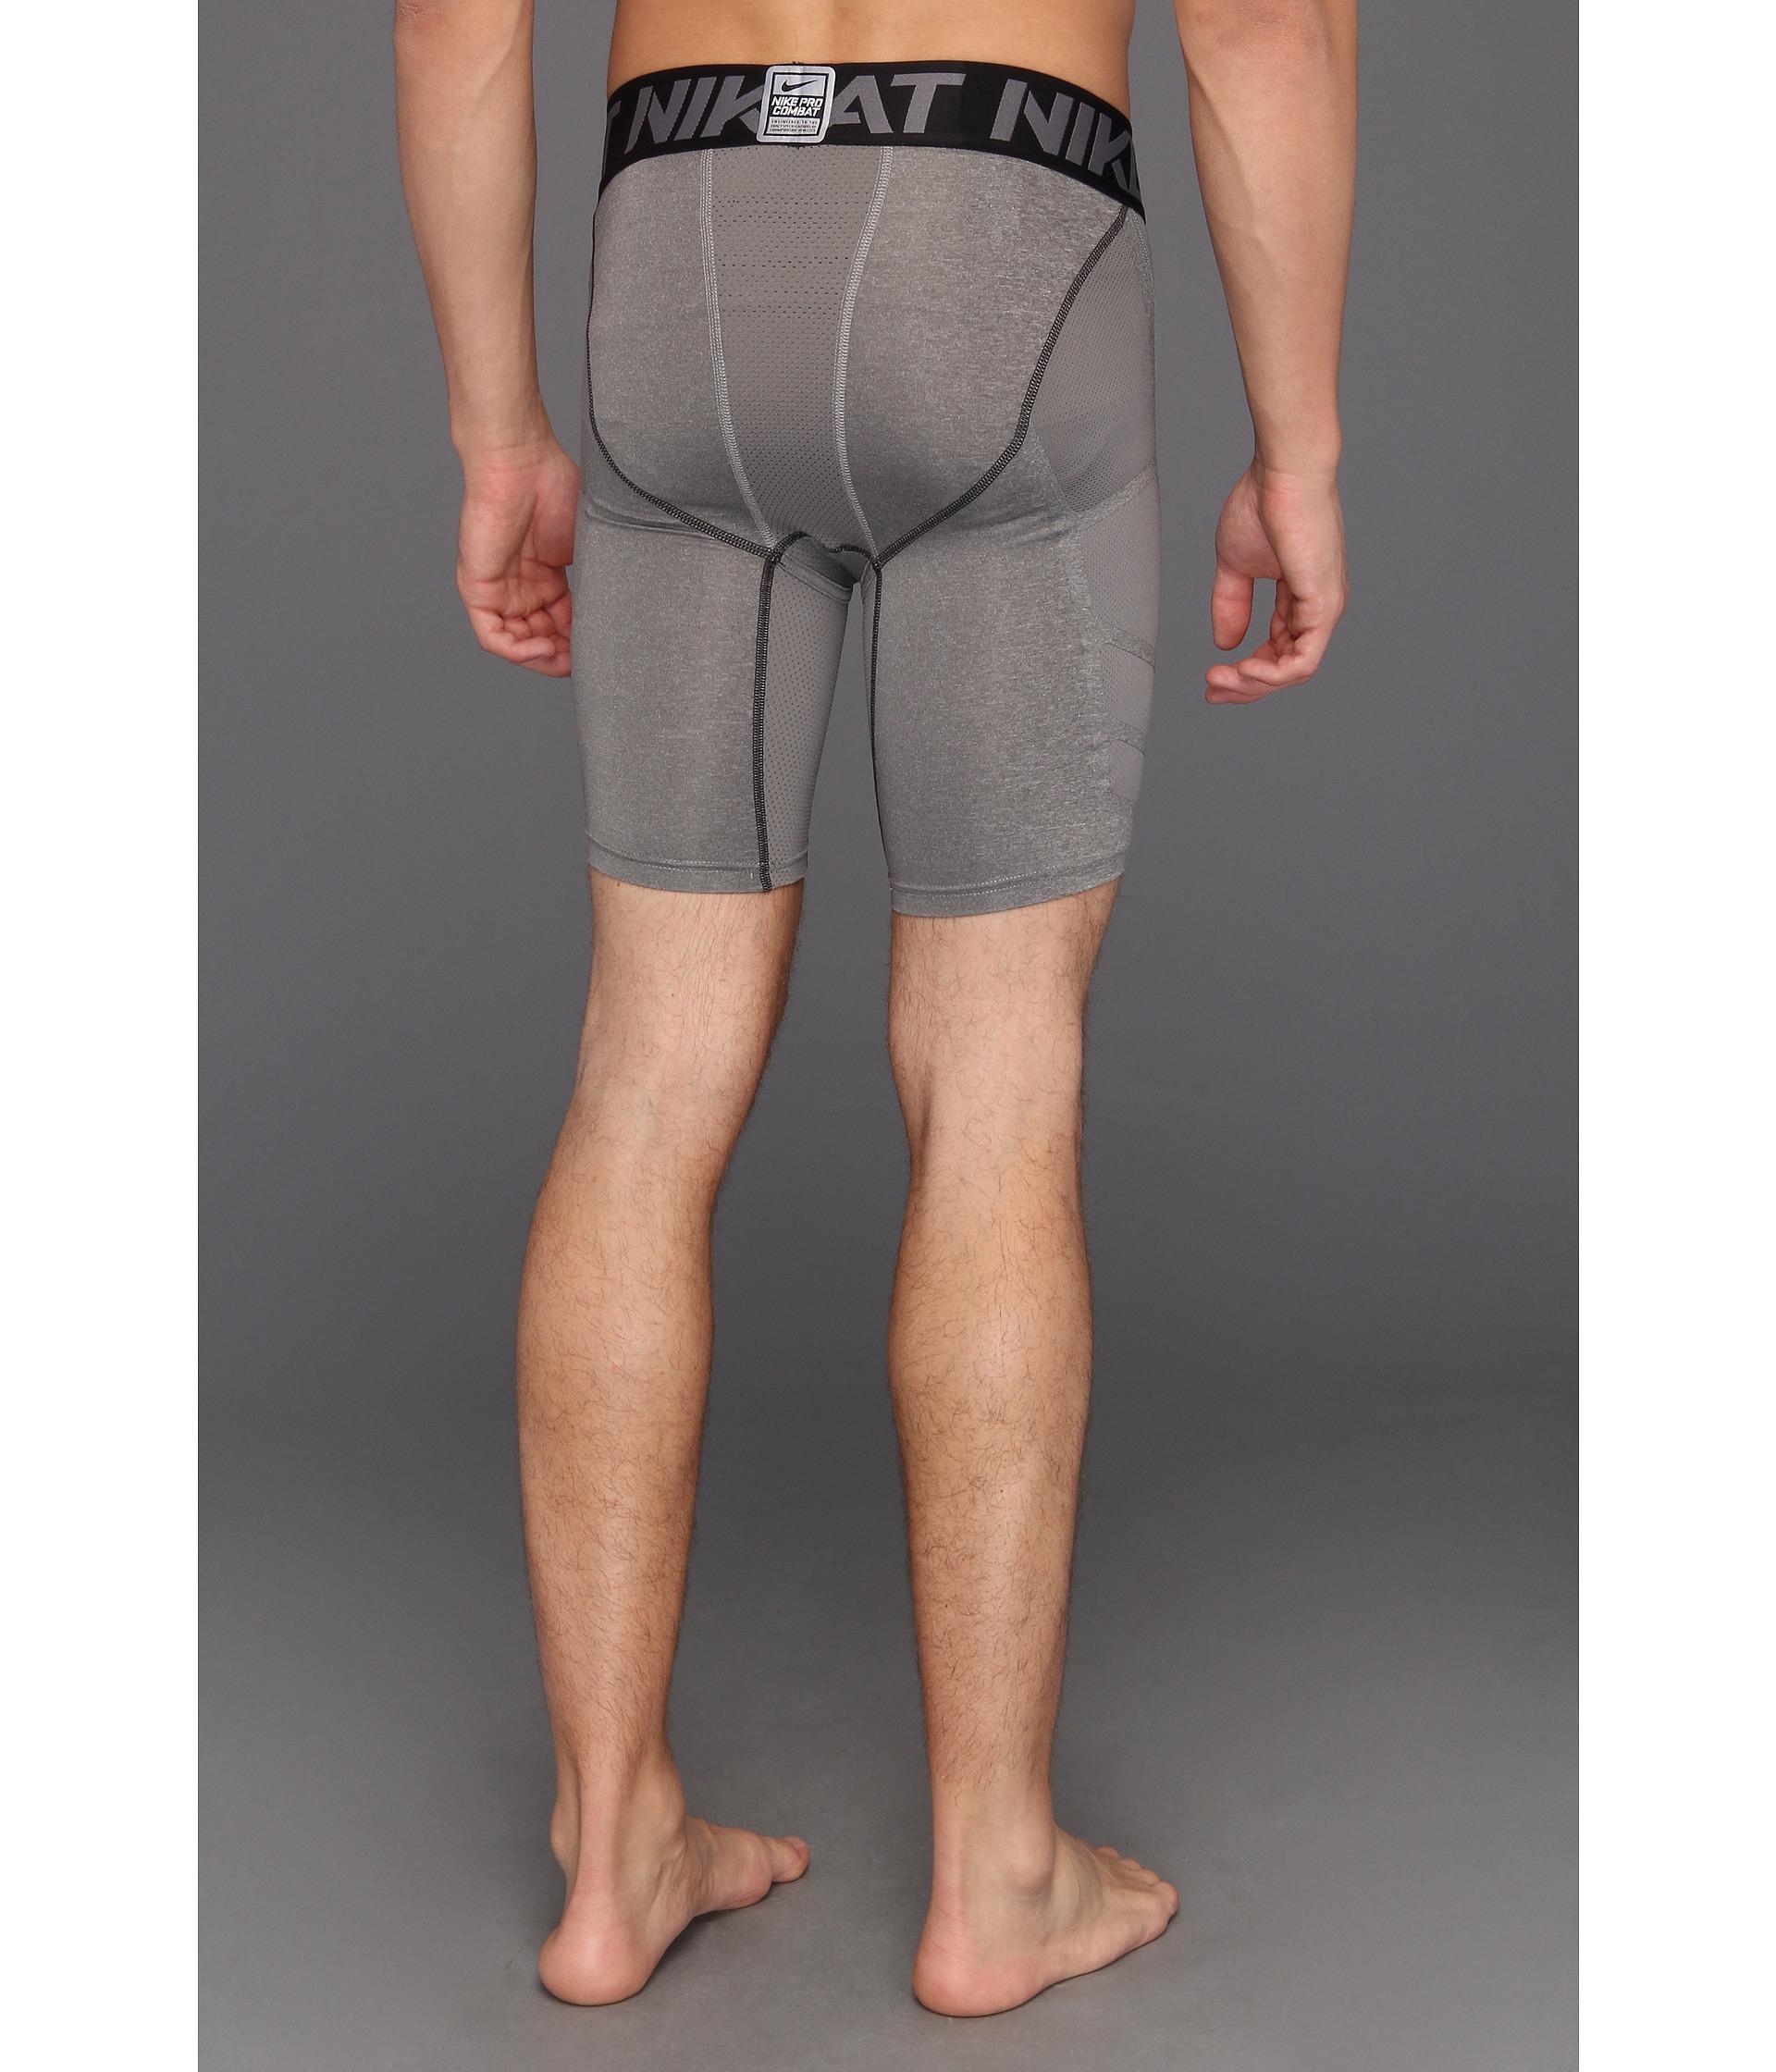 nike men's 9 inch compression shorts